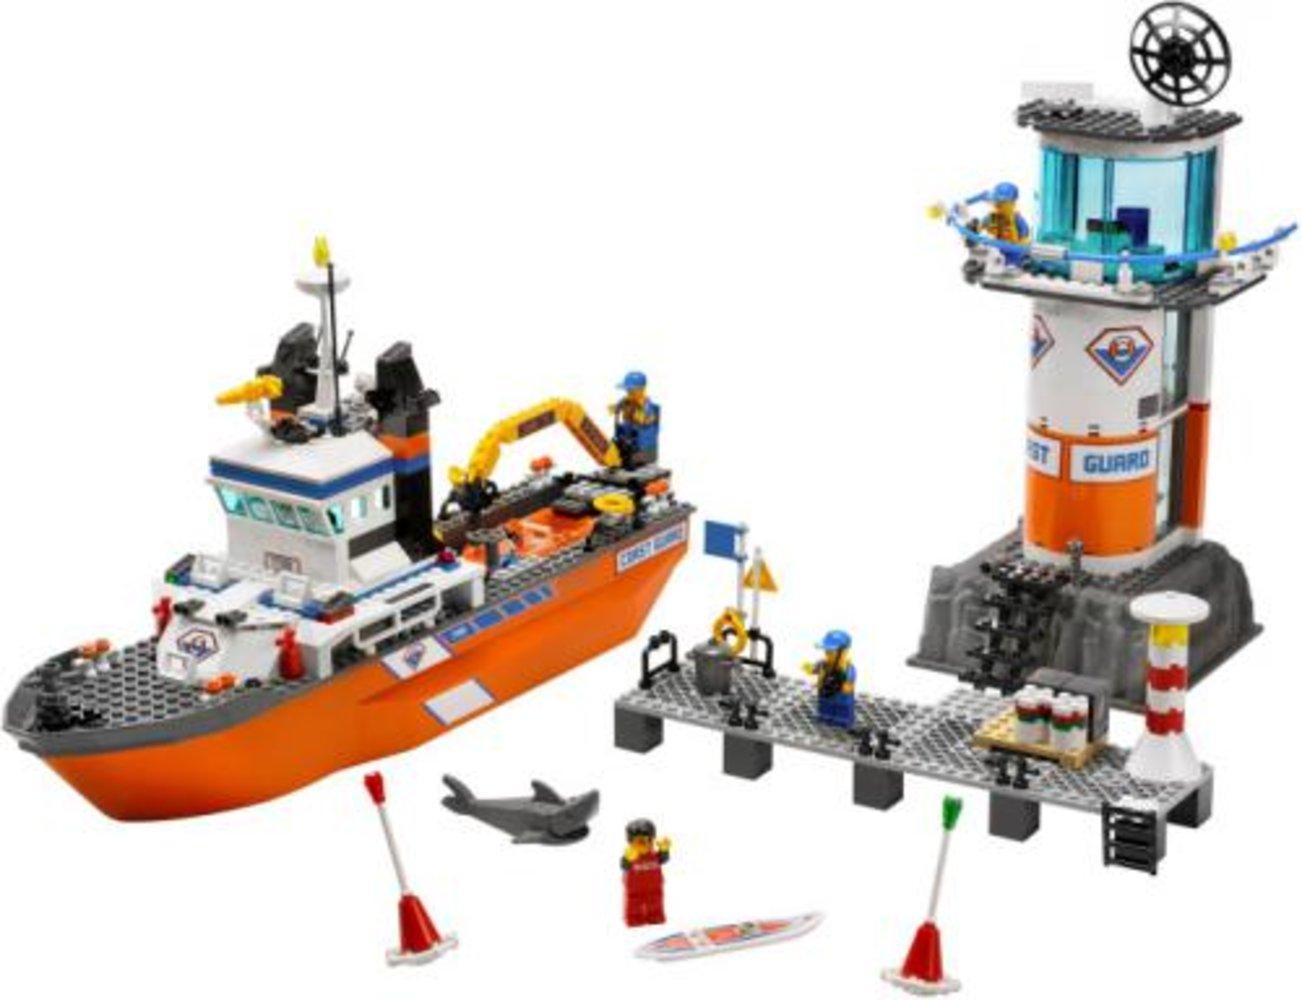 Coast Guard Patrol Boat and Tower